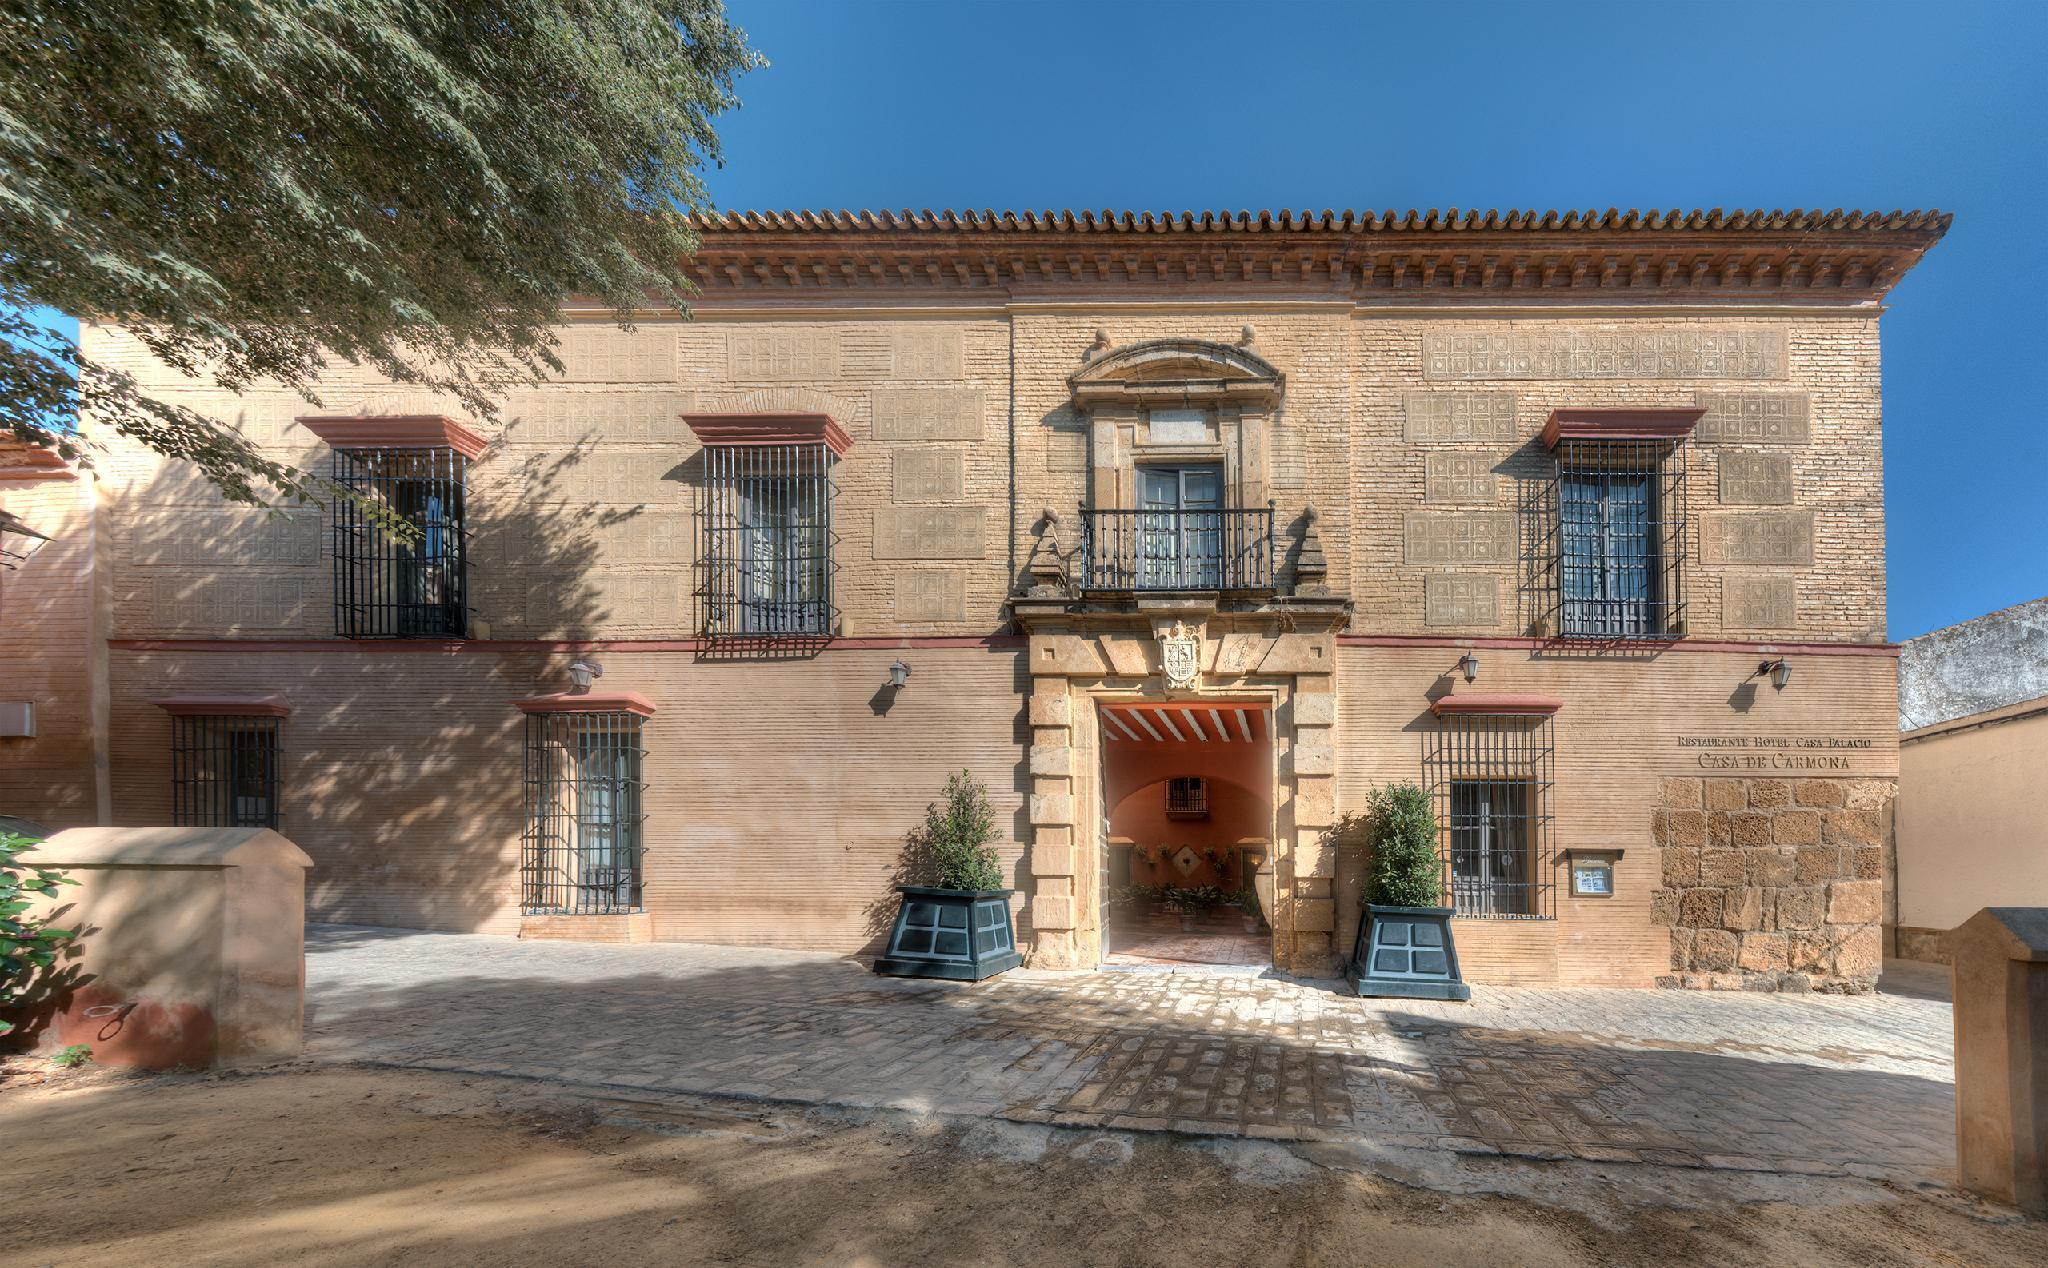 Casa De Carmona Hotel